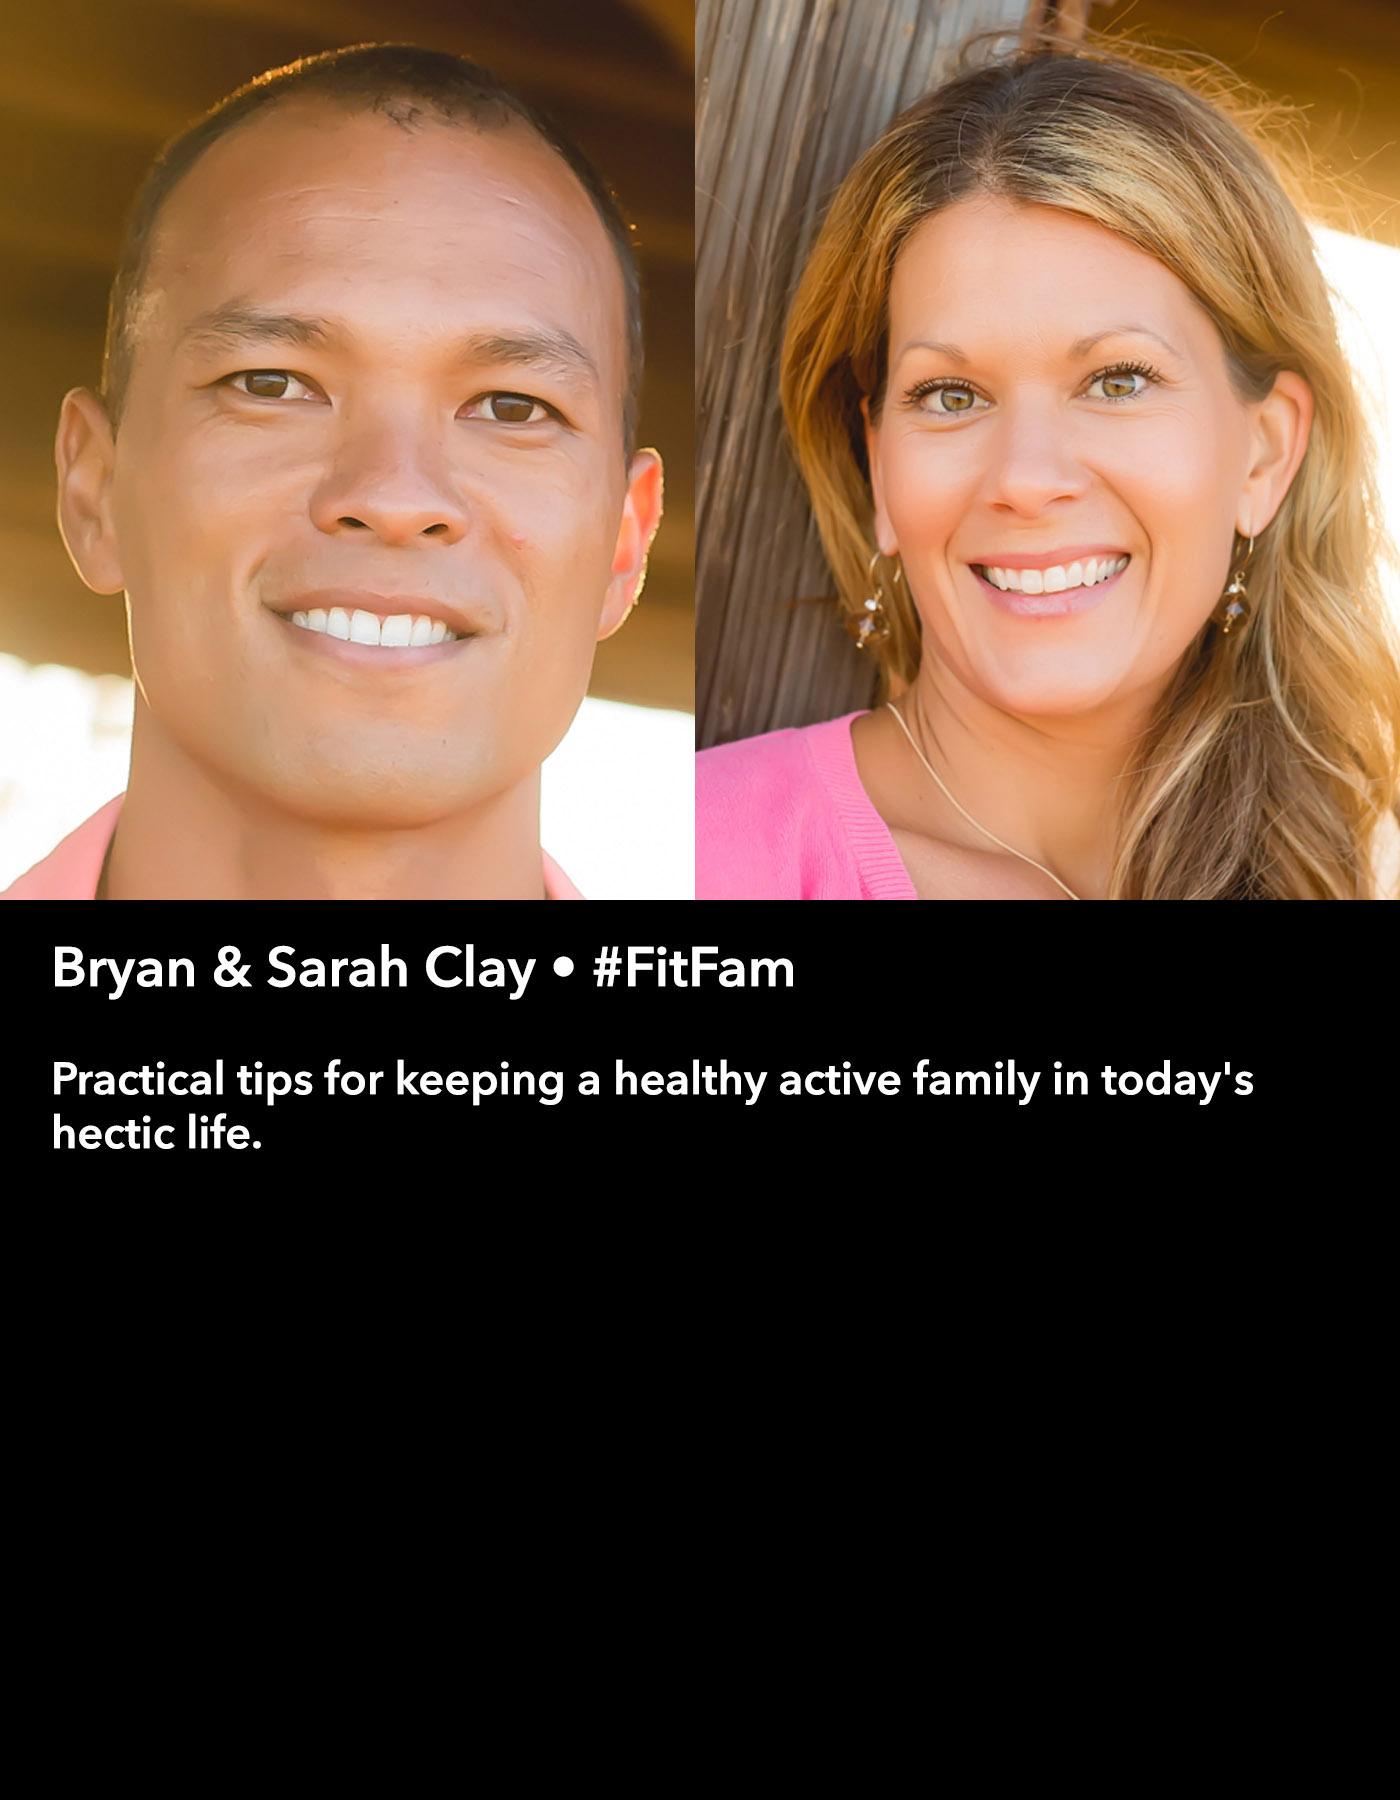 Bryan & Sarah Clay • #FitFam • Saturday Morning, March 18 • 10:30 – 11:45 am